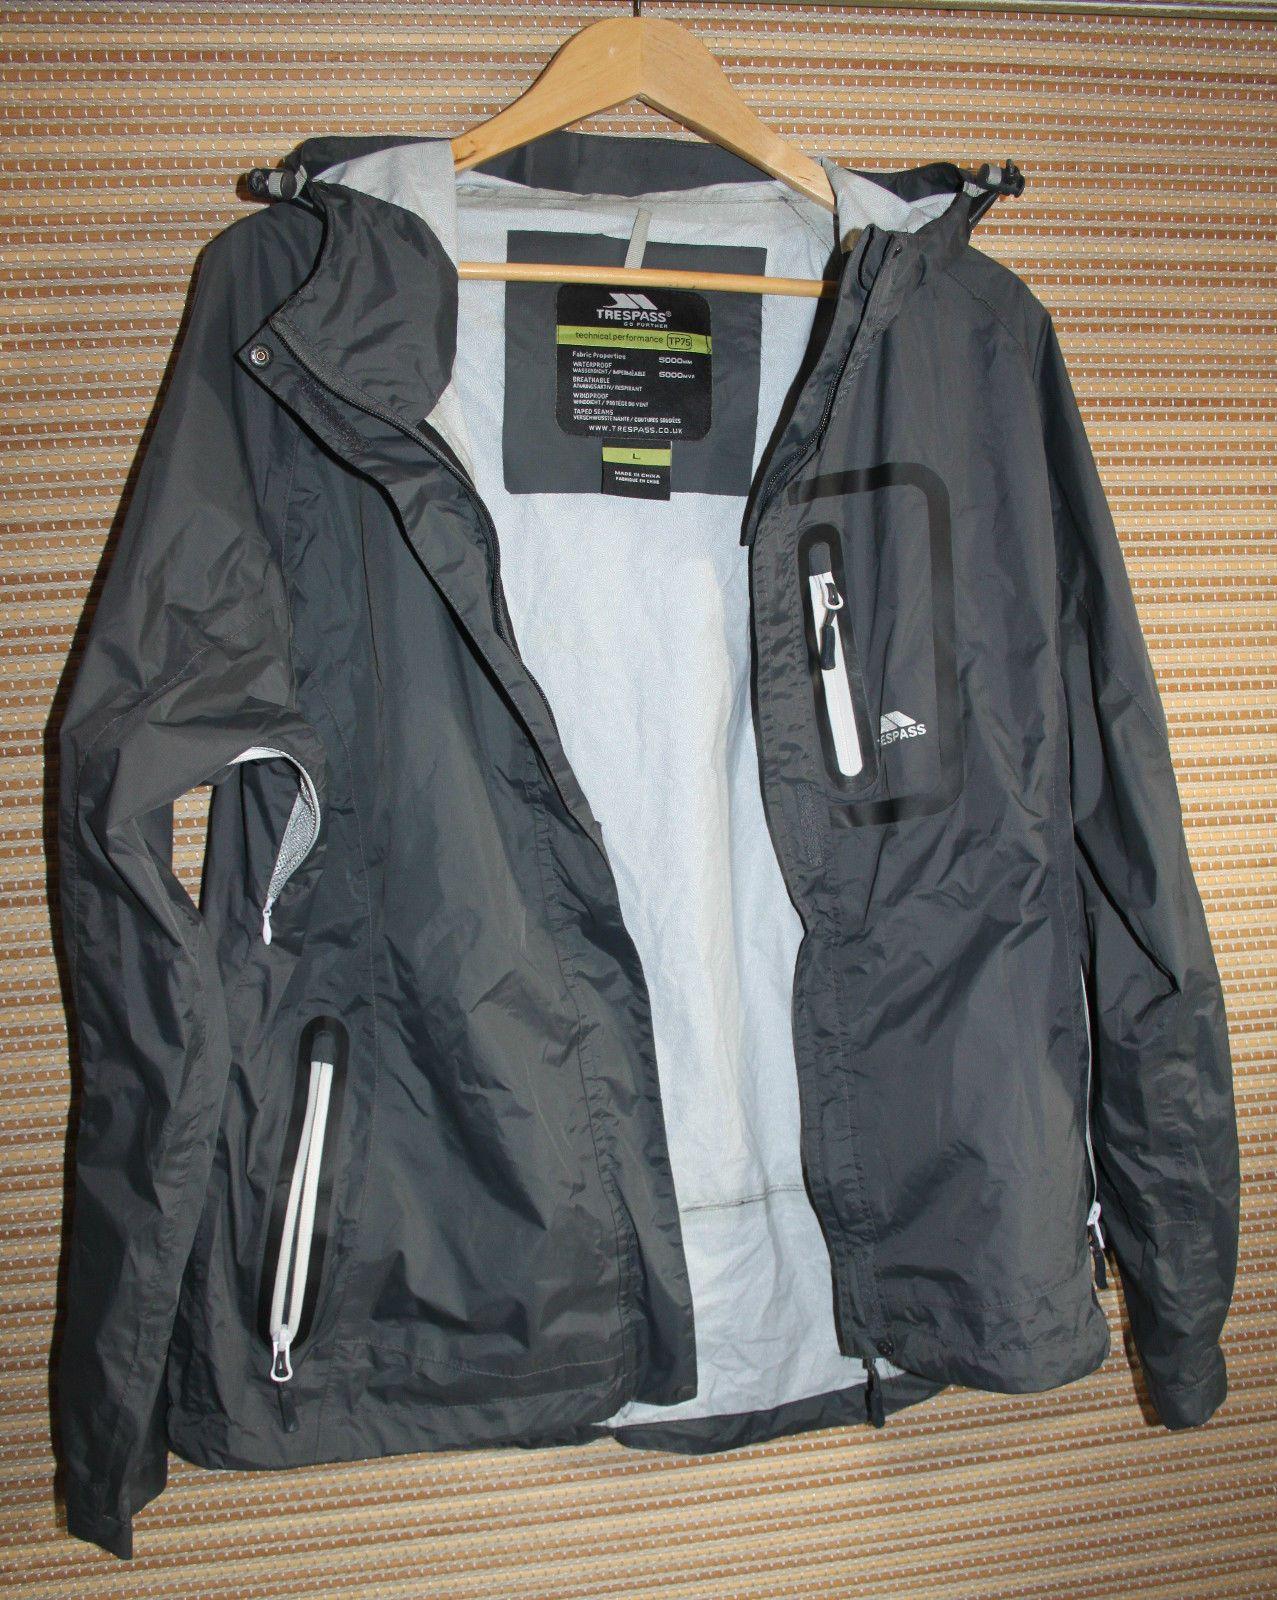 b8e0d9c644 Trespass Nantai Ladies Go Further Grey Tres-Tex TP75 Waterproof Jacket Size  L in Clothes